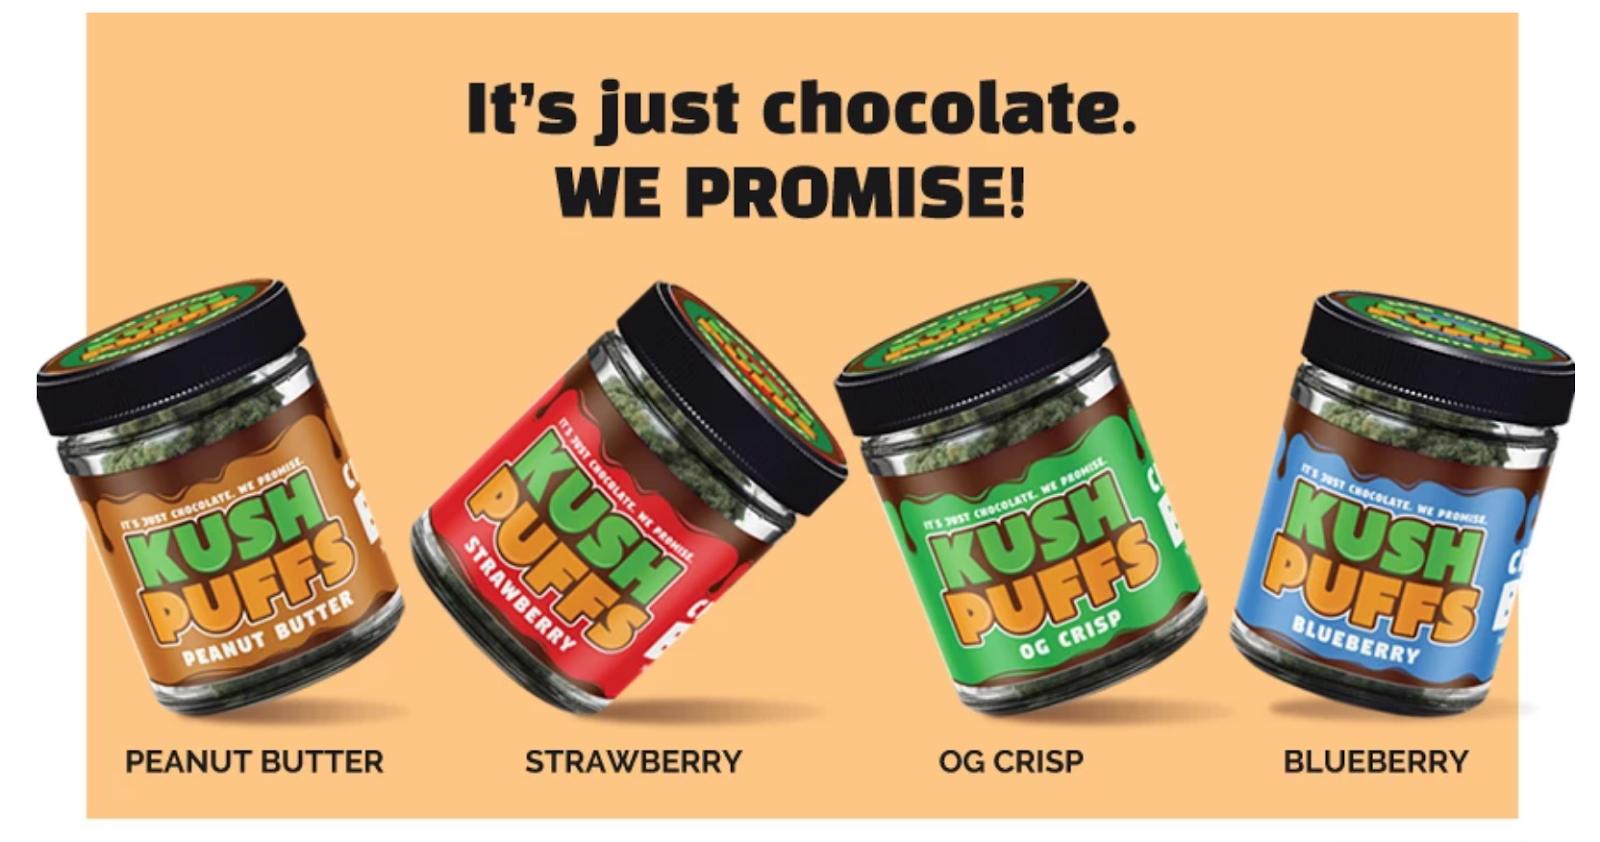 It's Just Chocolate - Kush Puffs